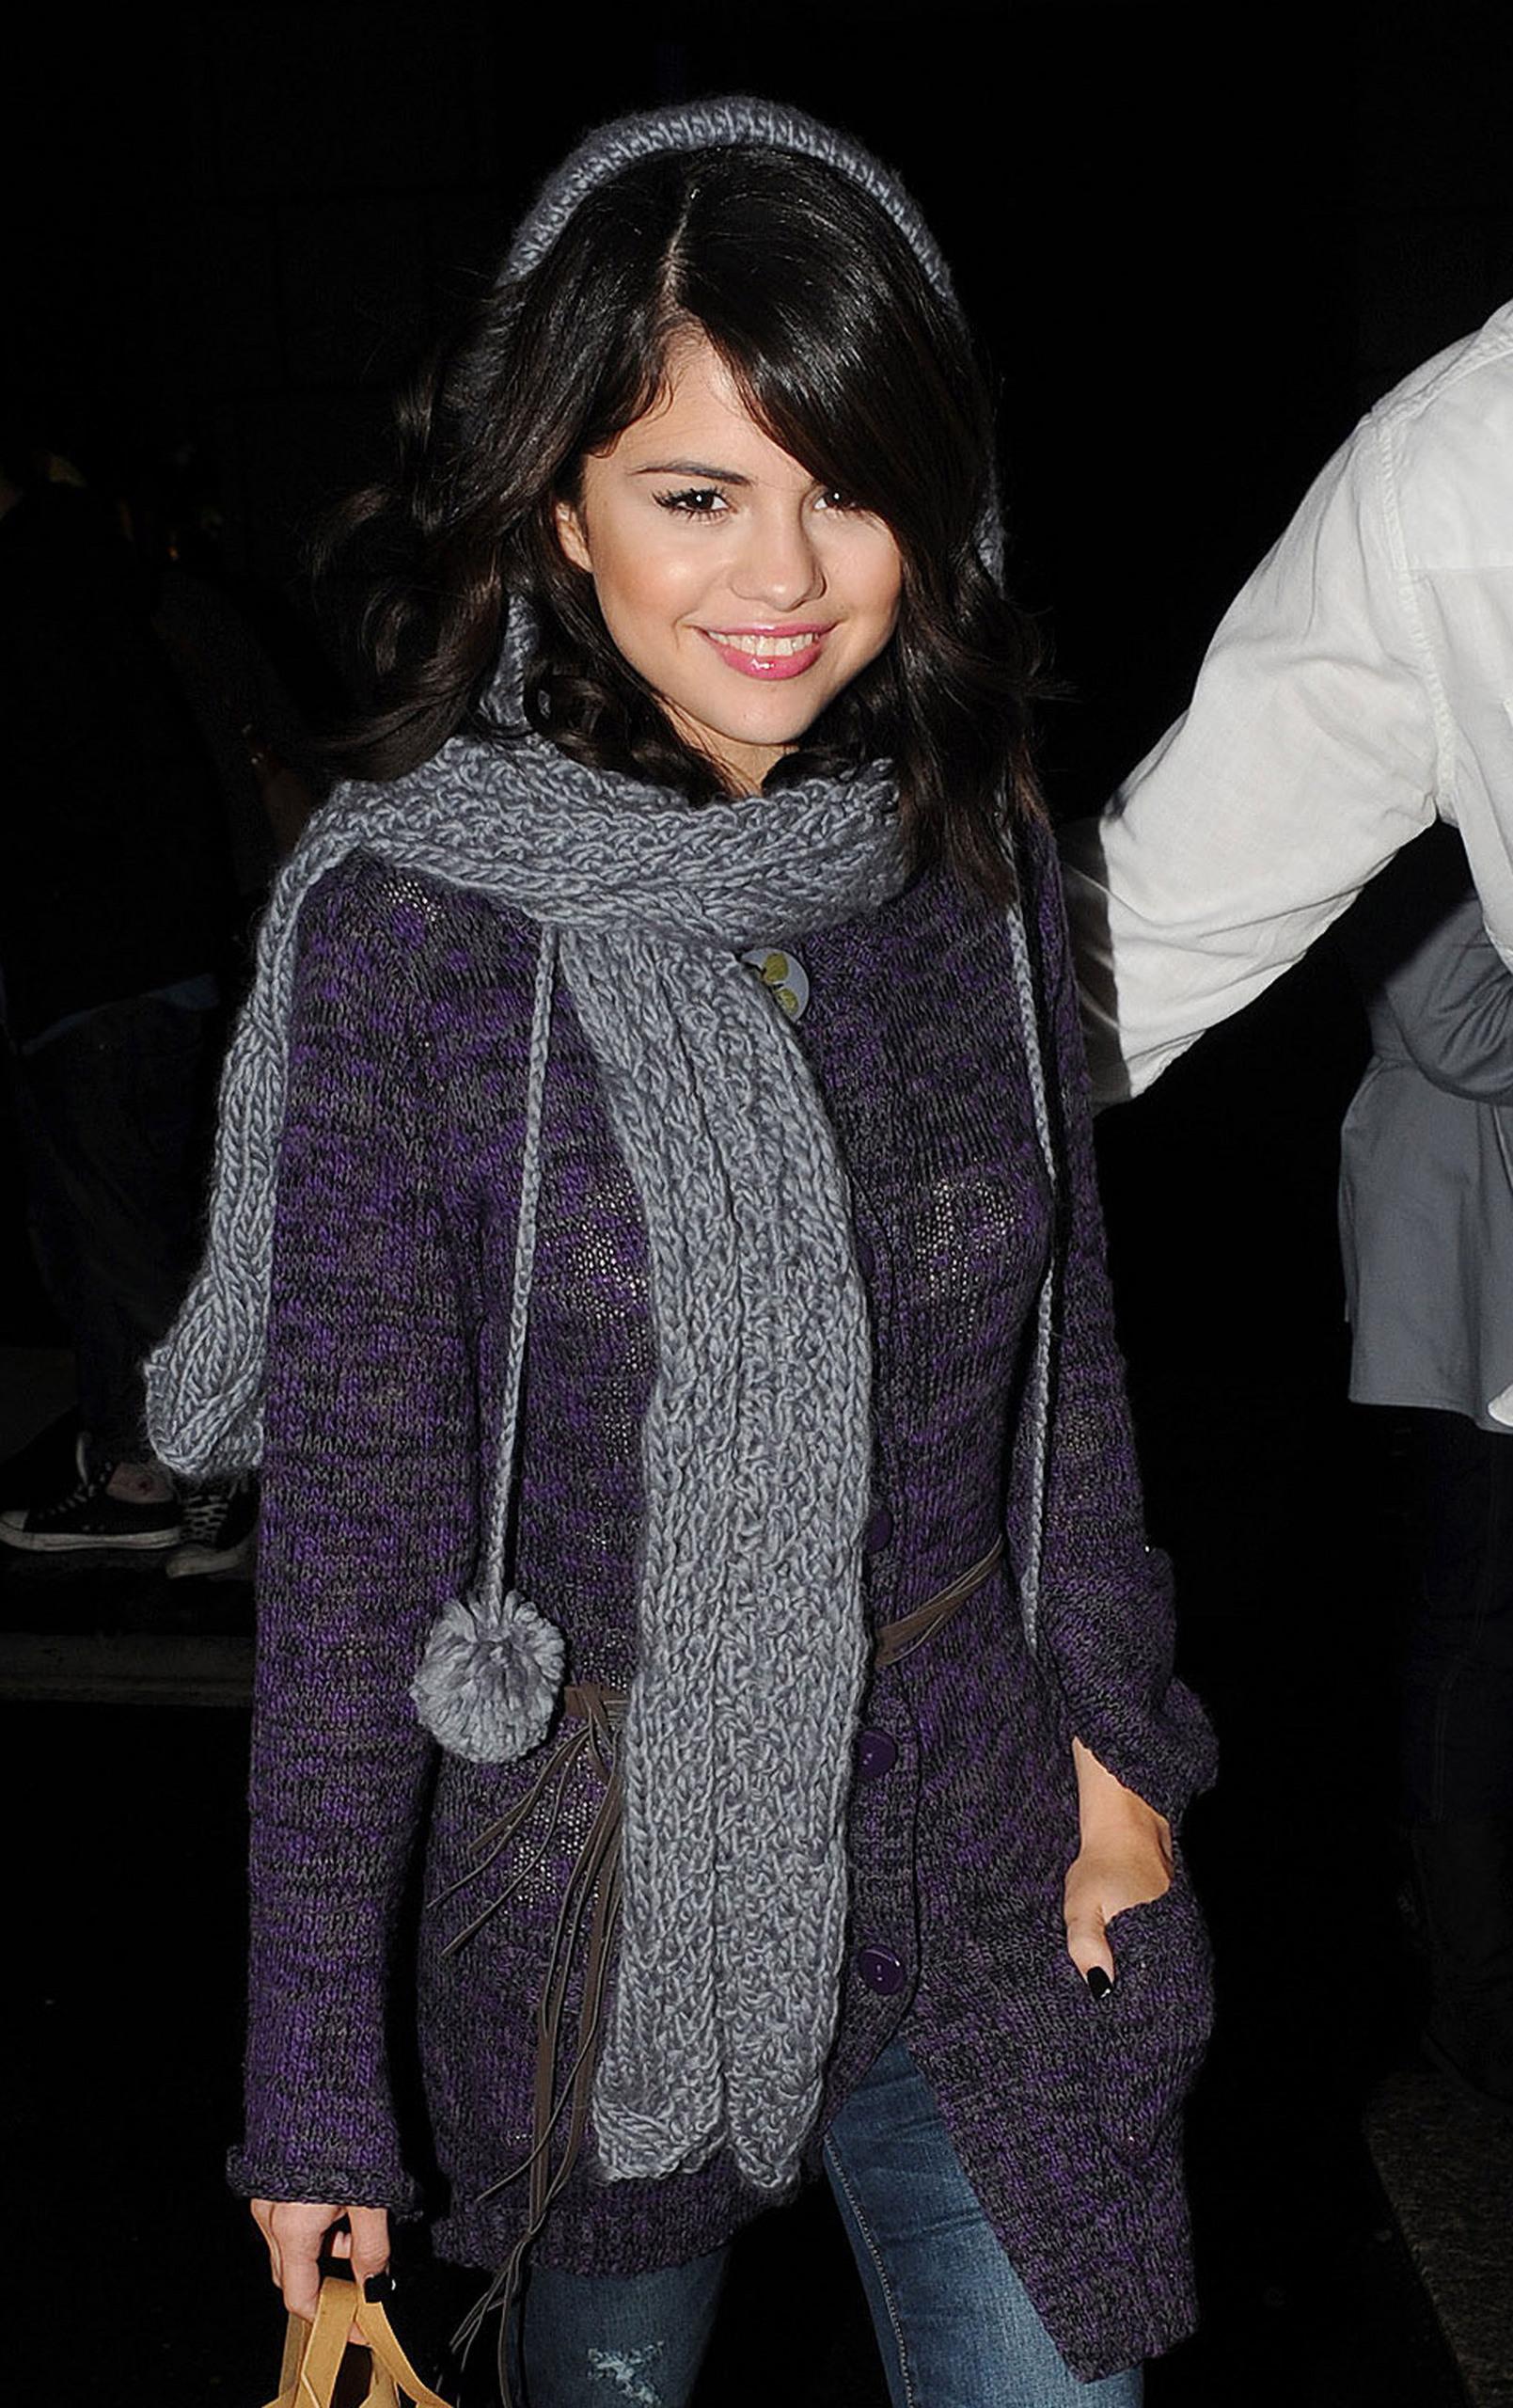 Selena Gomez Candids 2010 - Selena Gomez Photo (16406364